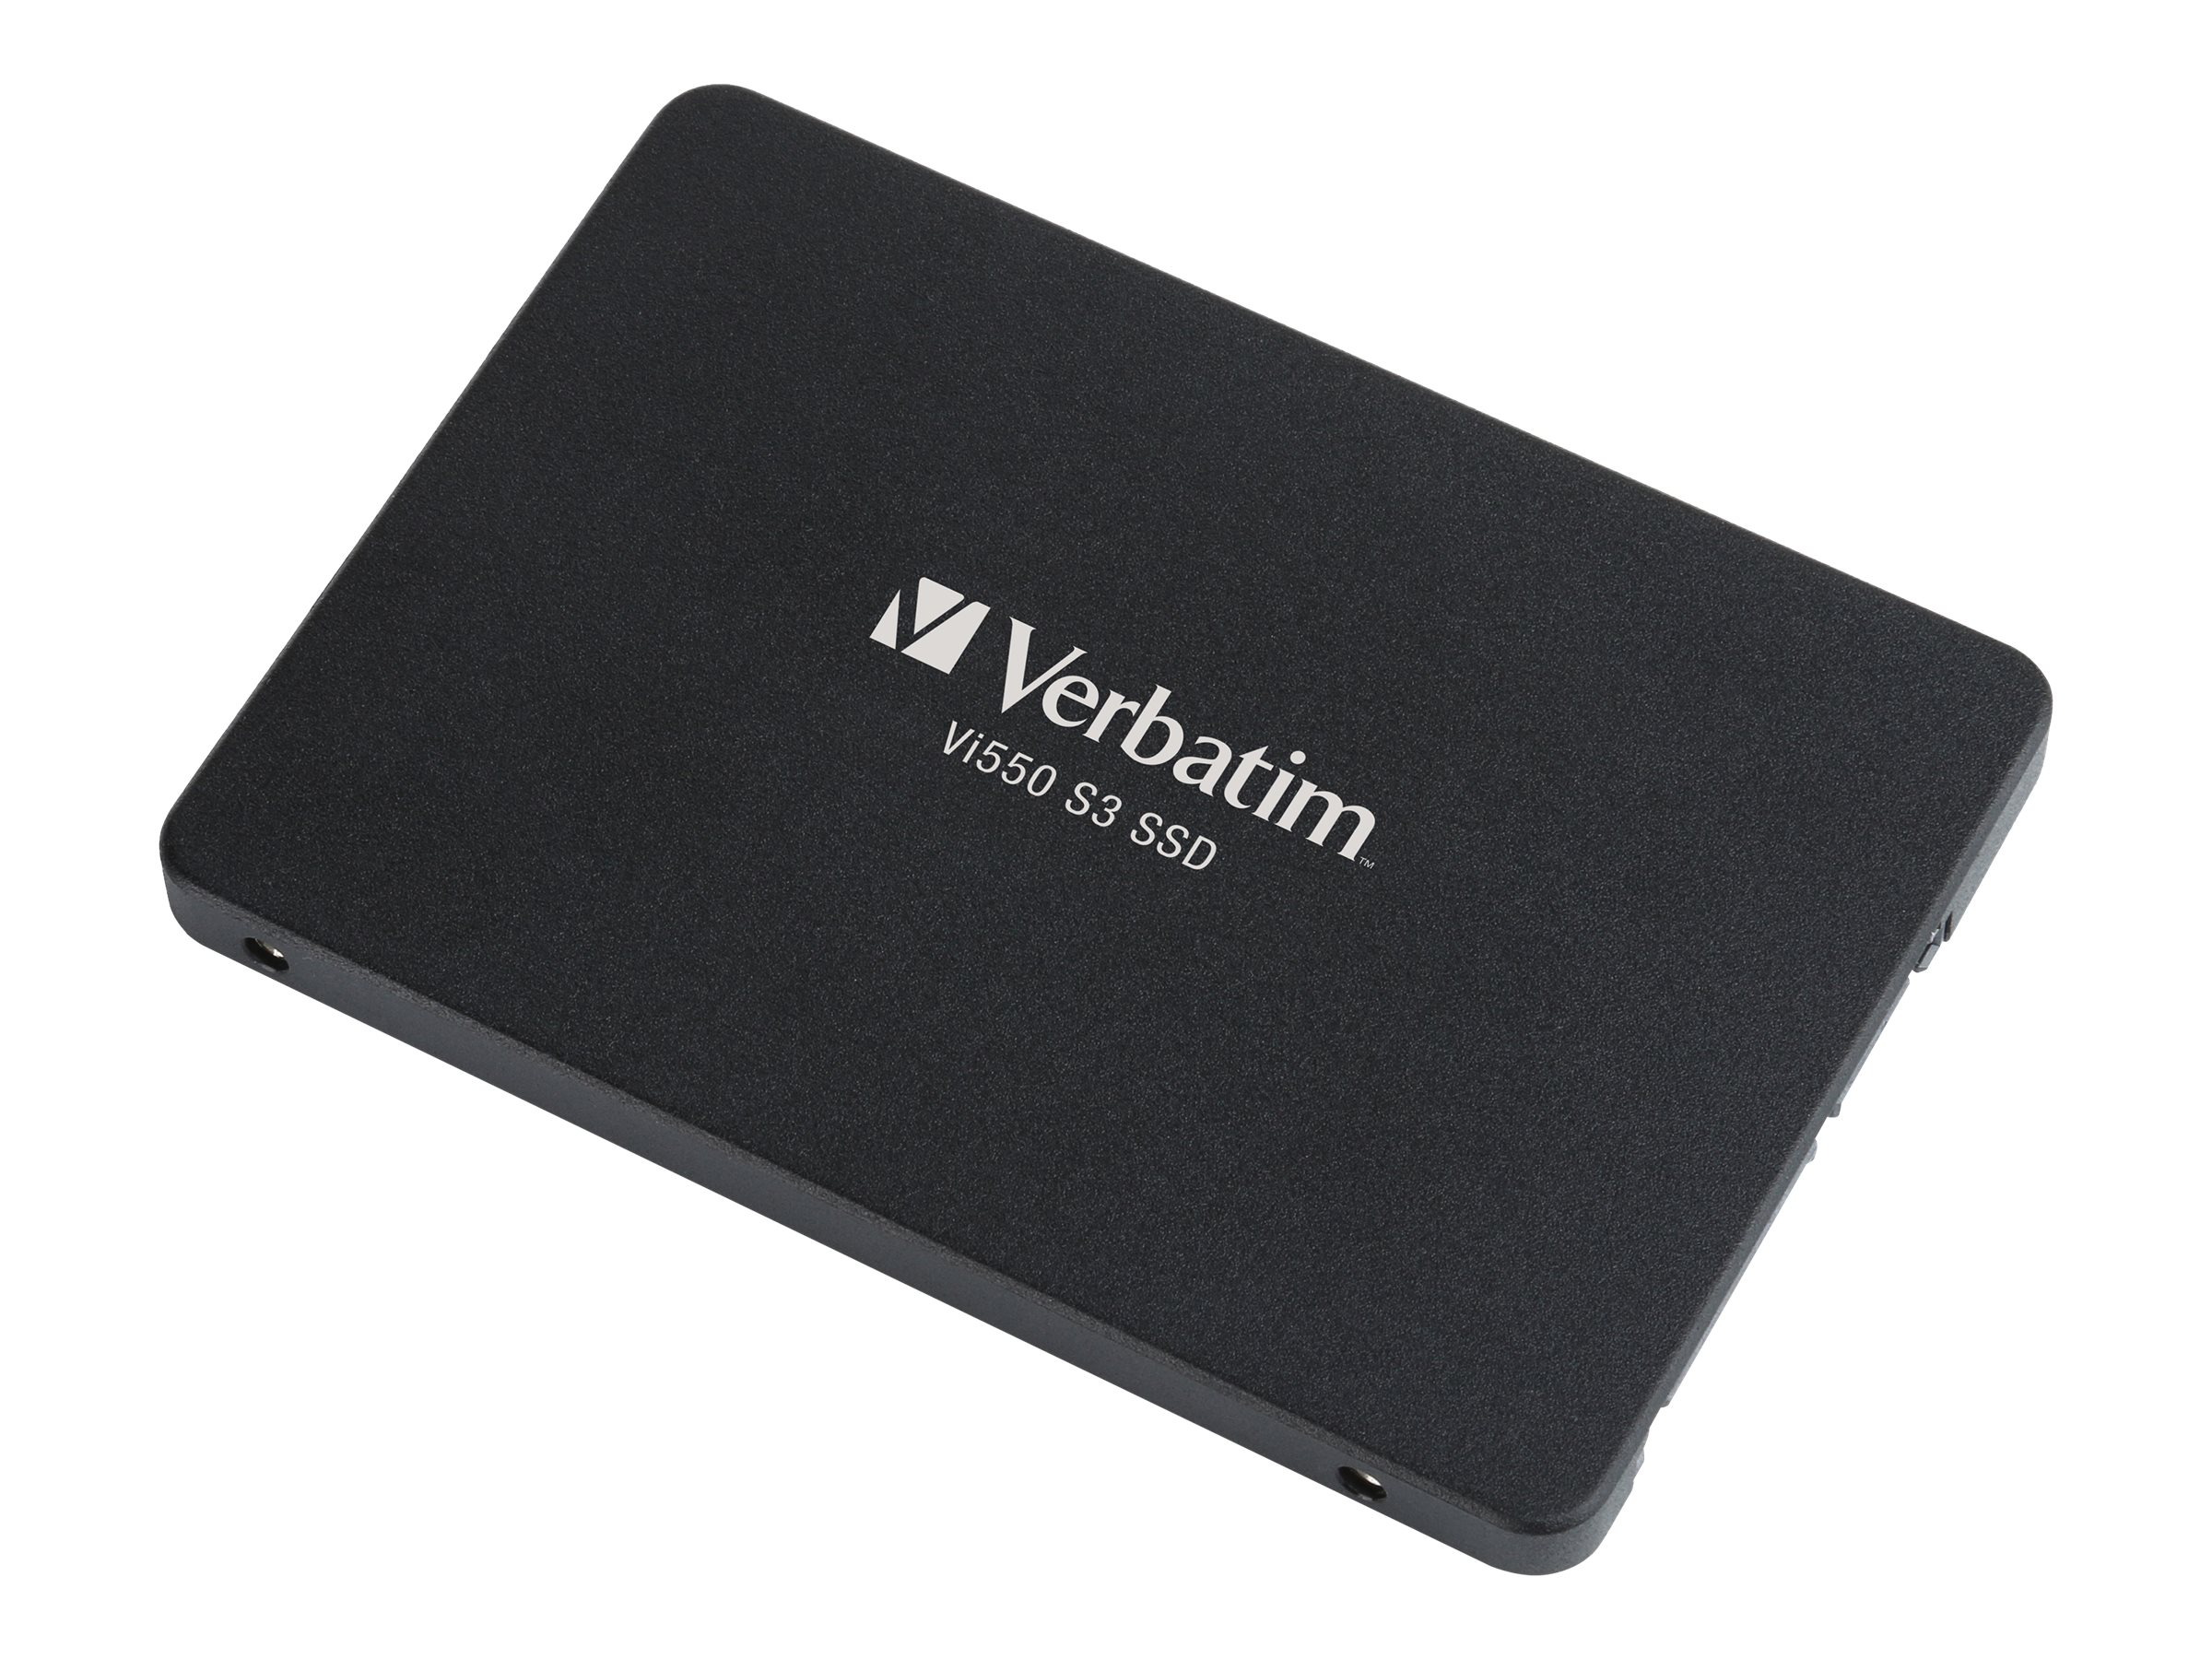 "Verbatim Vi550 - 128 GB SSD - intern - 2.5"" (6.4 cm)"